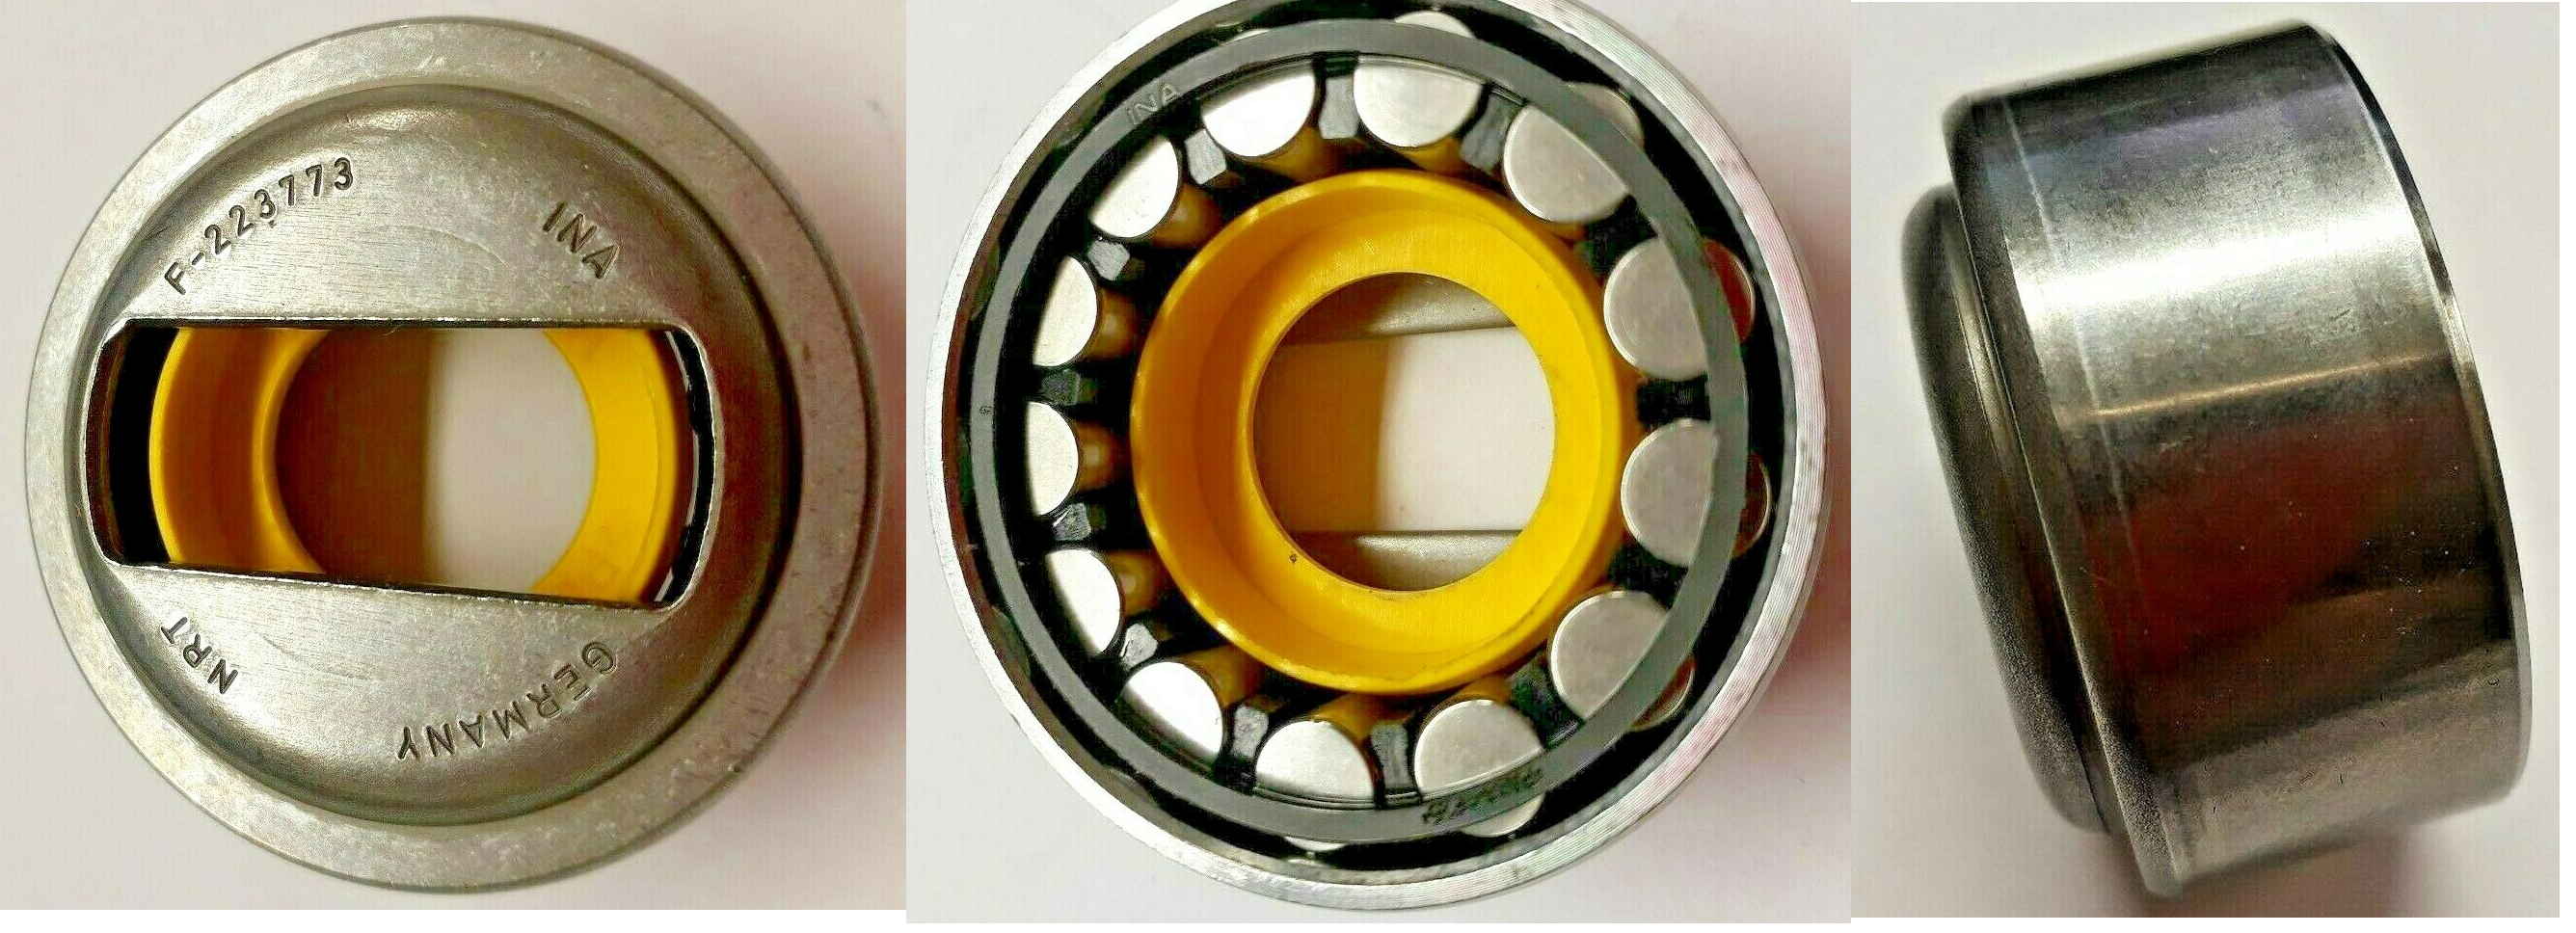 bearing INA 712 0613 10 (INA F-223773)